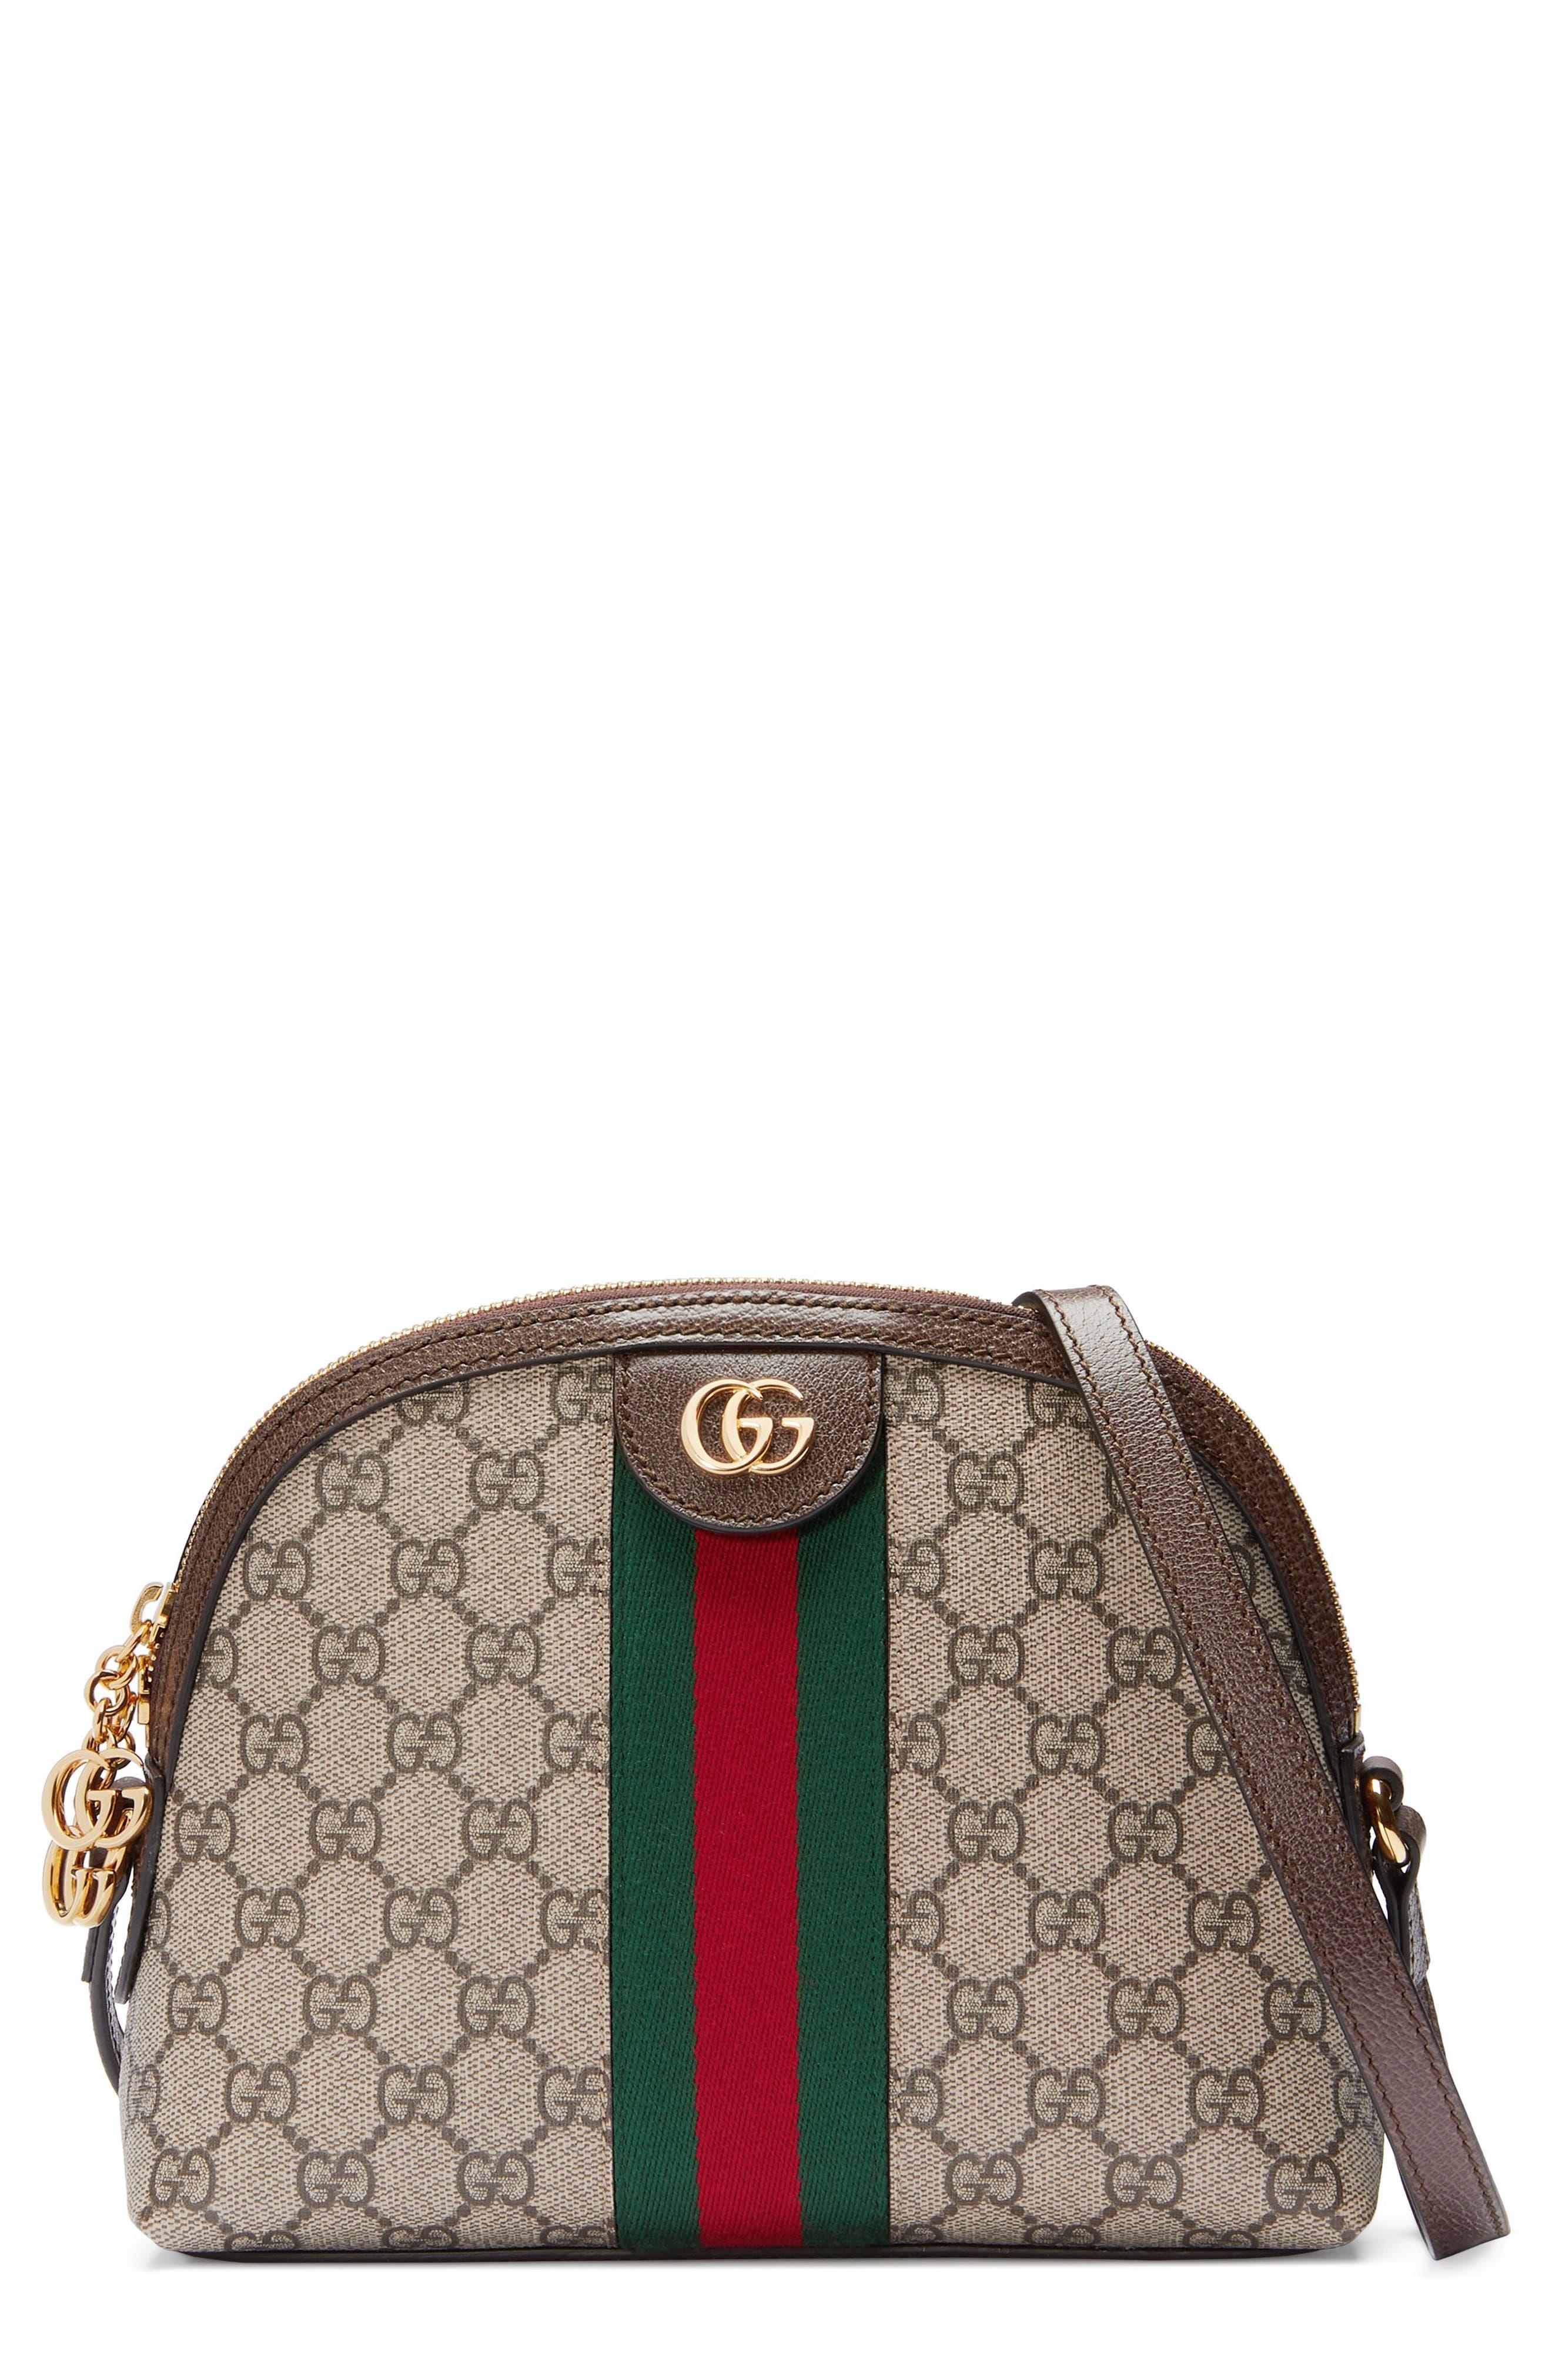 GG Supreme Canvas Shoulder Bag,                         Main,                         color, BEIGE EBONY/ NERO/ RED